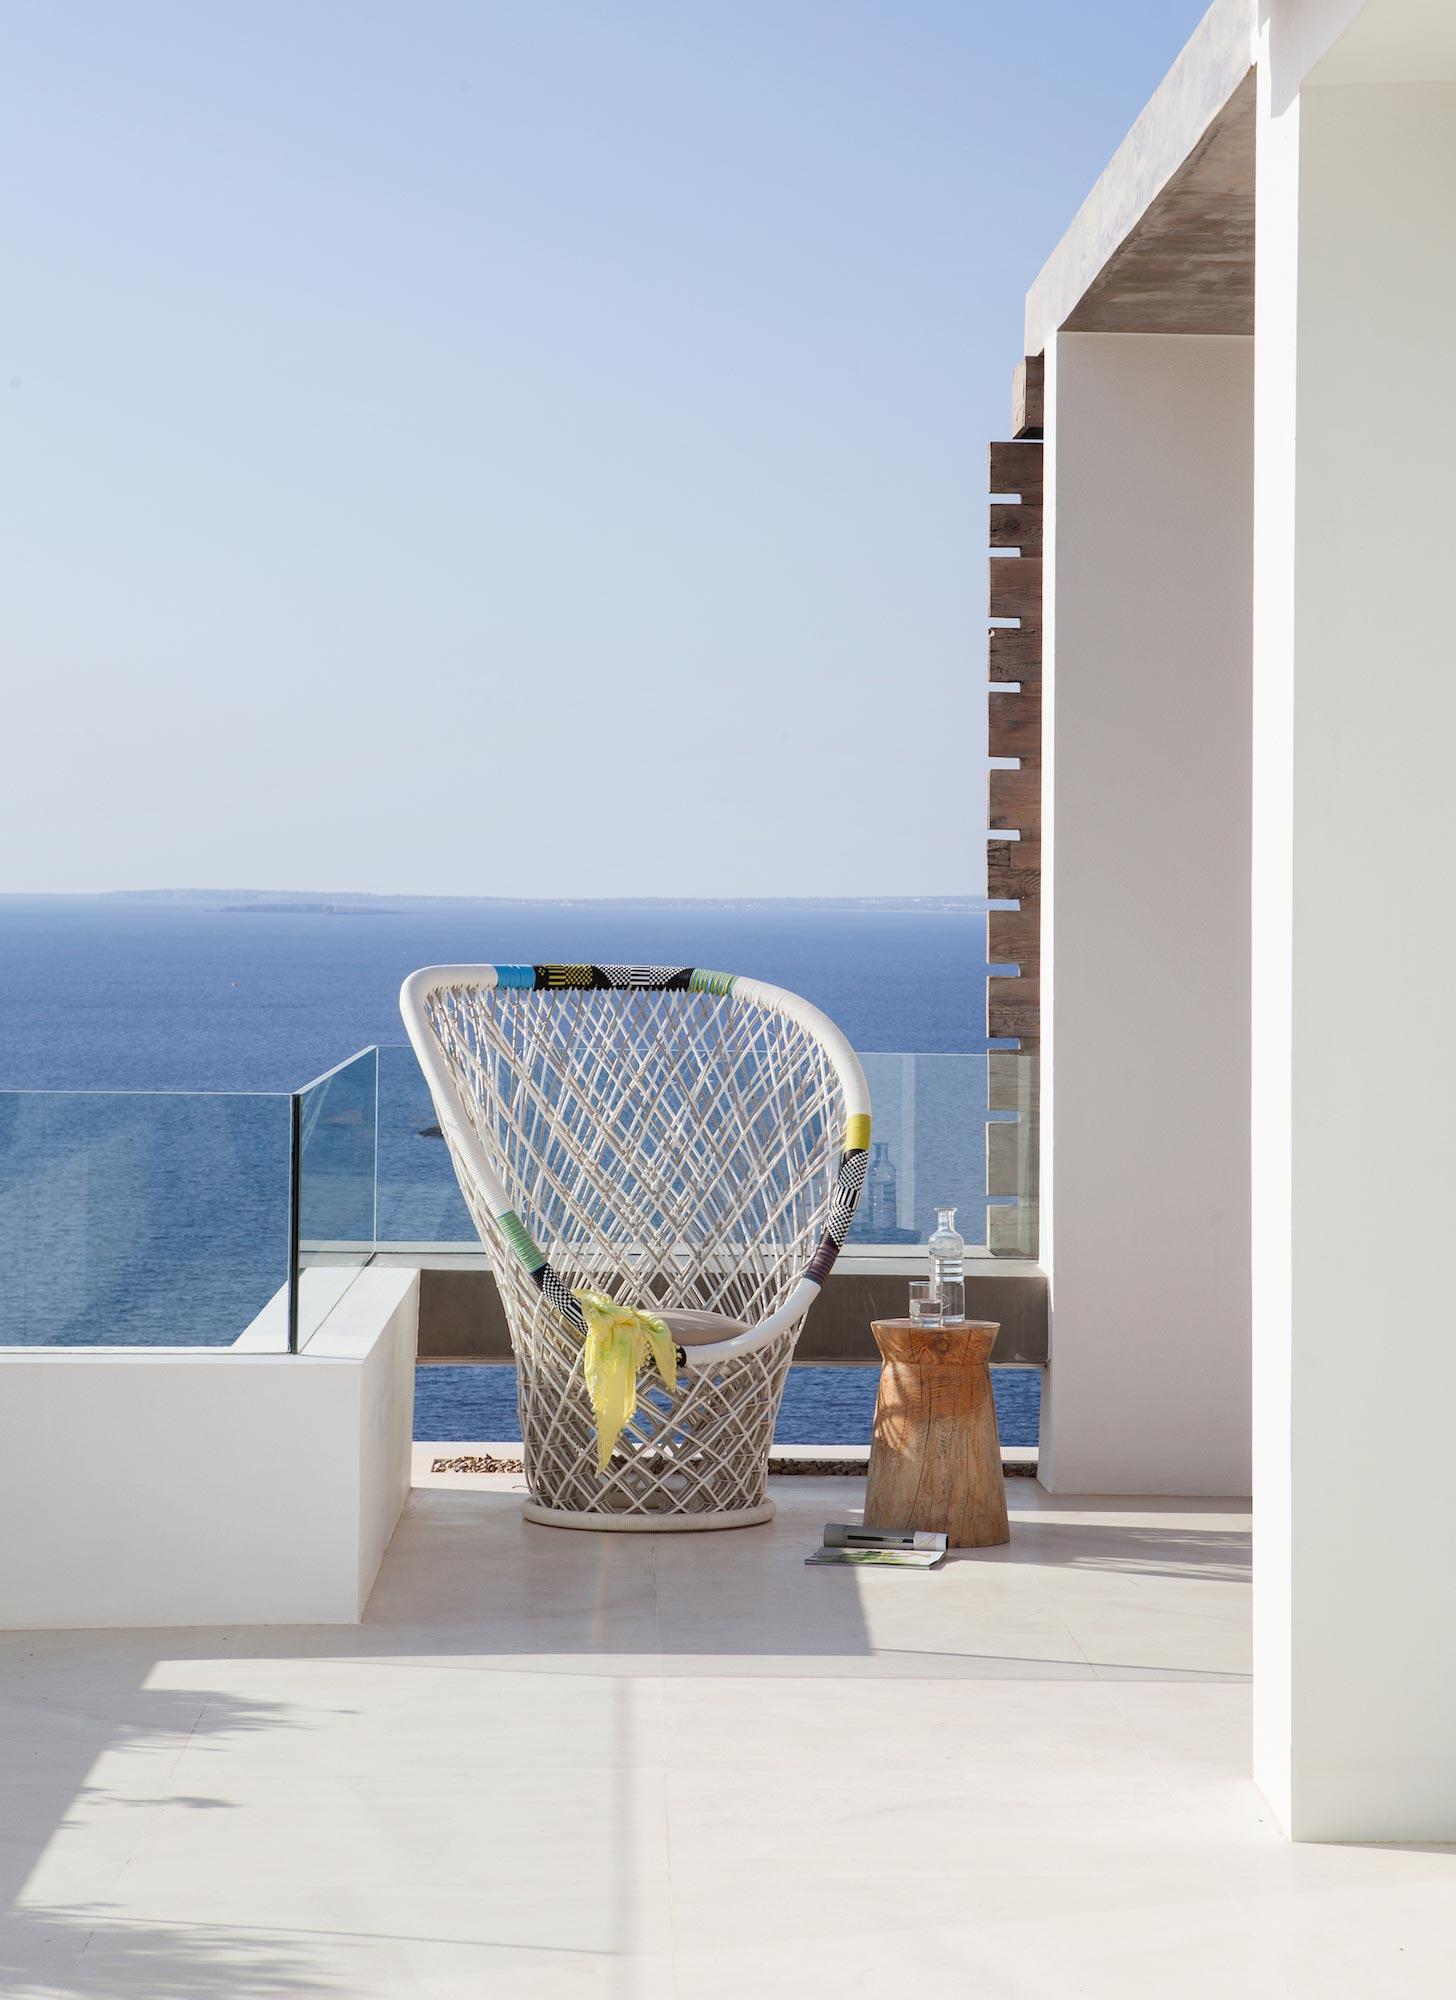 Home design ideas roca llisa by saota and arrcc spain - Roca llisa ibiza ...